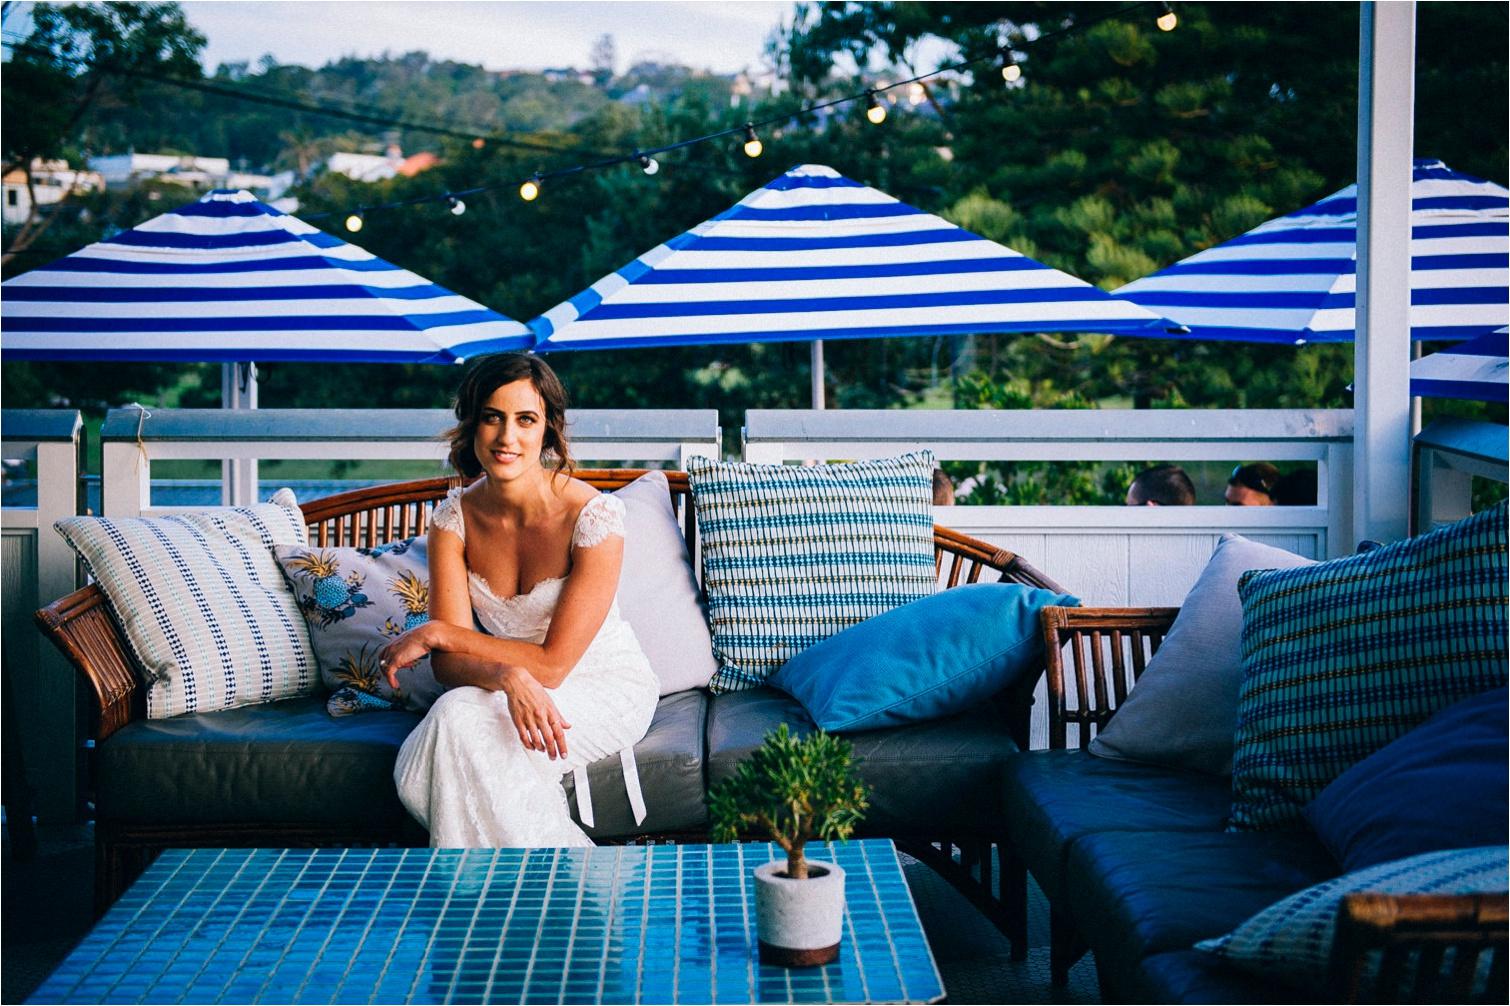 Nicole&Carlie_Watsons_Bay_Hotel_Wedding_by_Gold_Coast_Photographers-The_Follans59.jpg